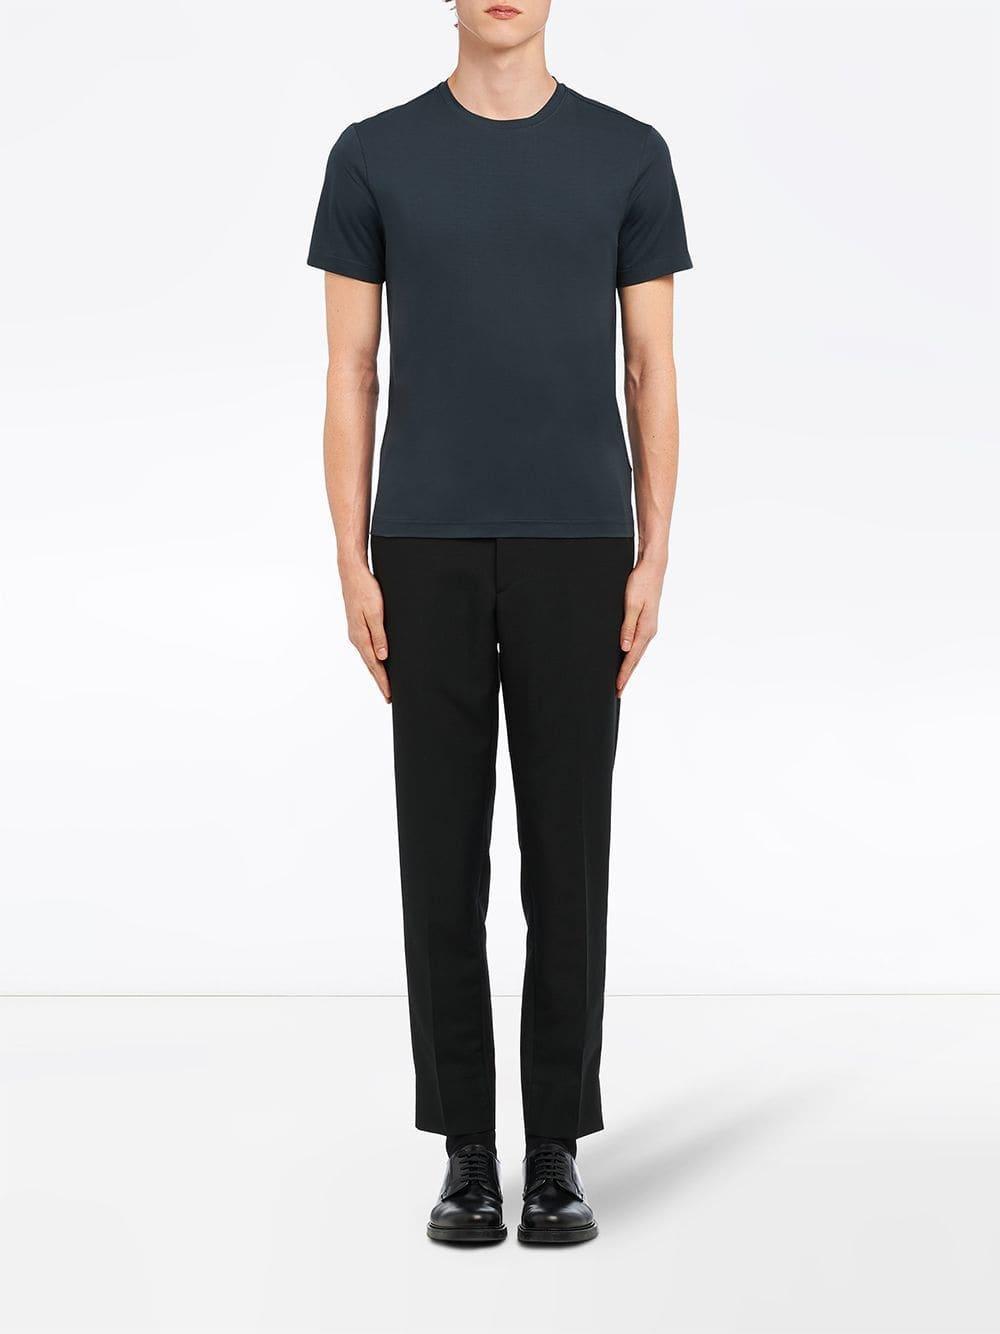 Lyst - Prada Cotton Stretch T-shirt in Blue for Men 28c16f461b035